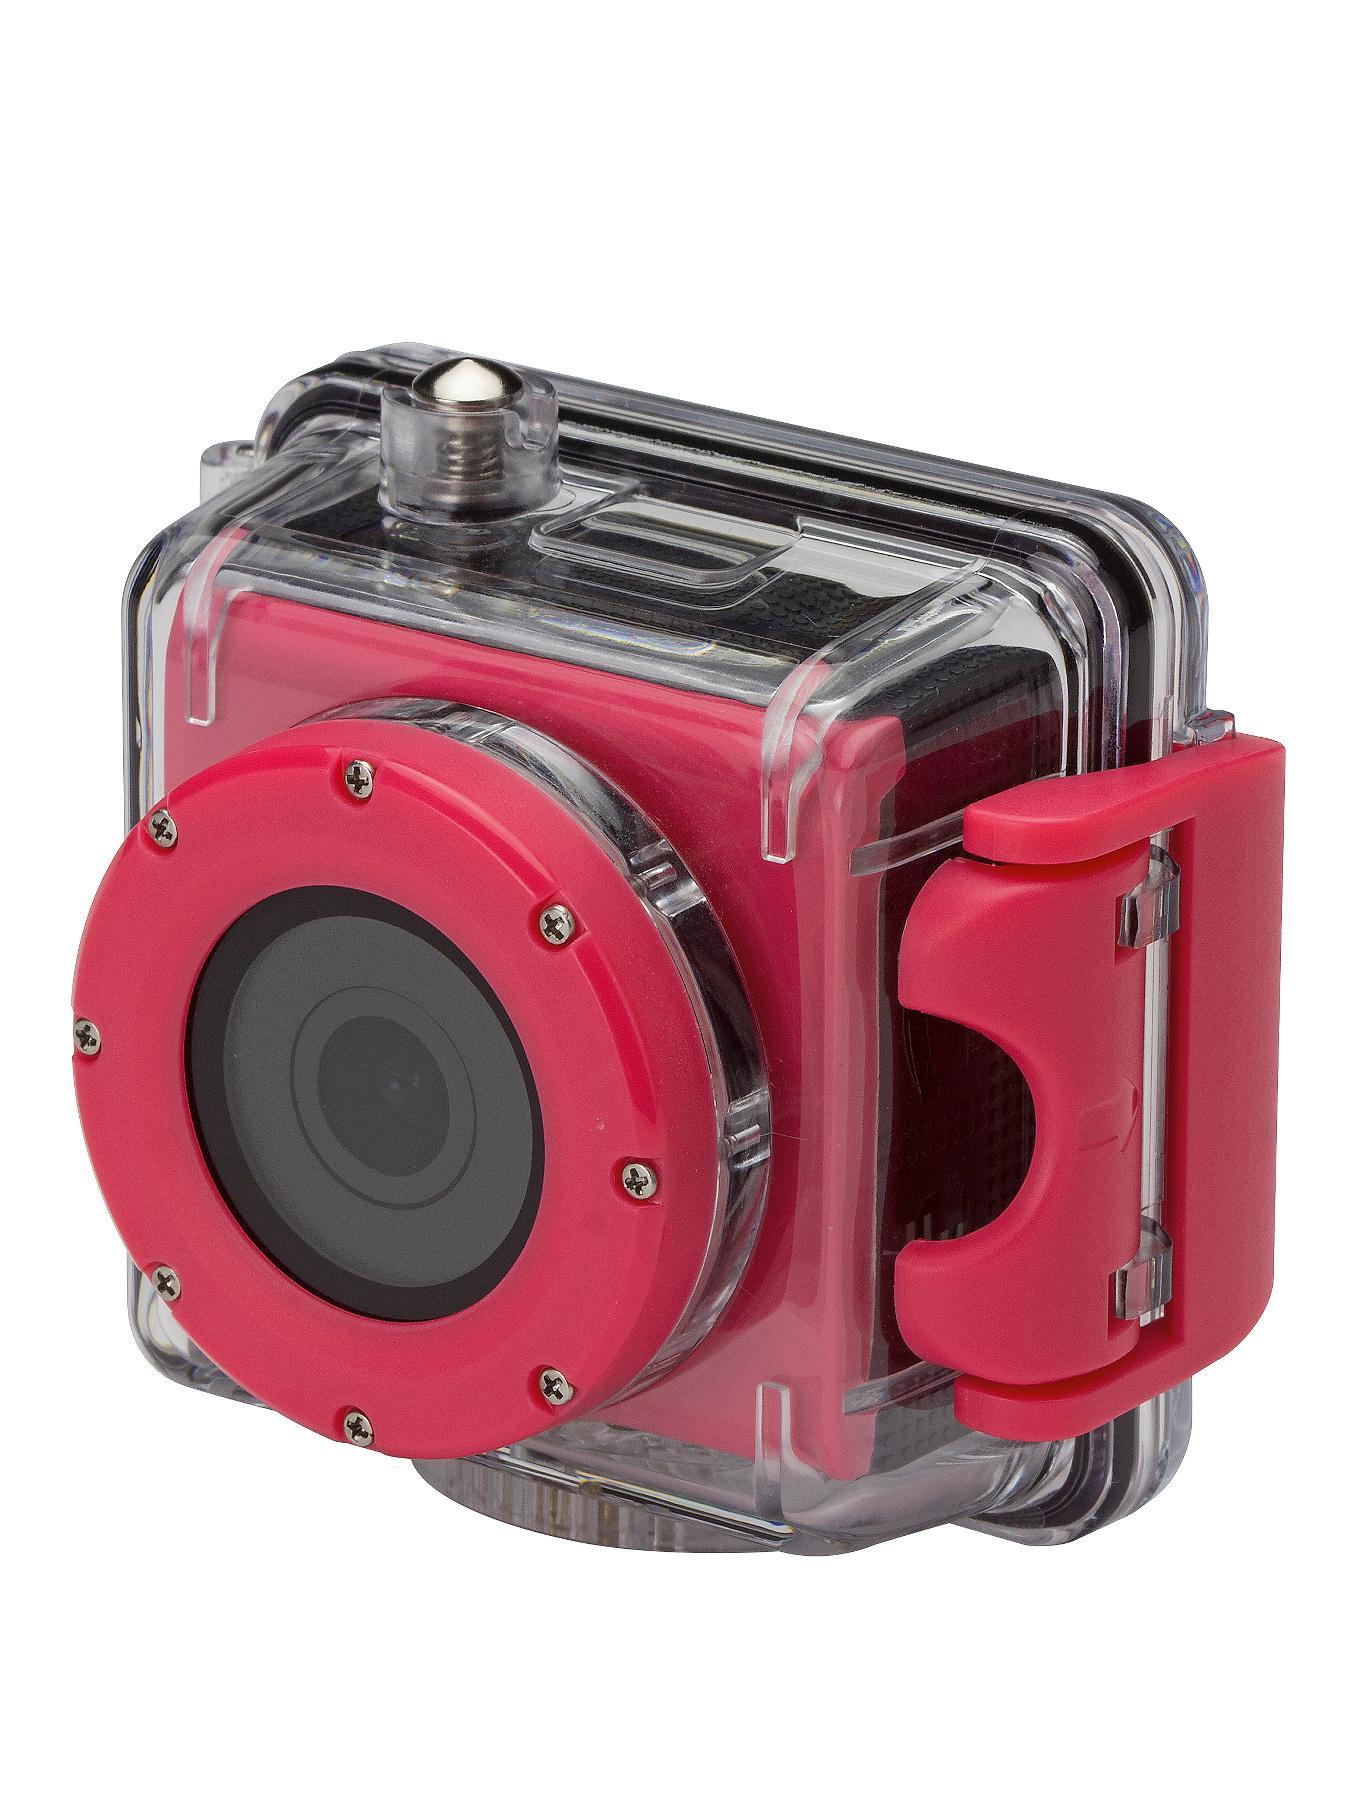 Kitvision Splash 1080p Action Camera - Pink